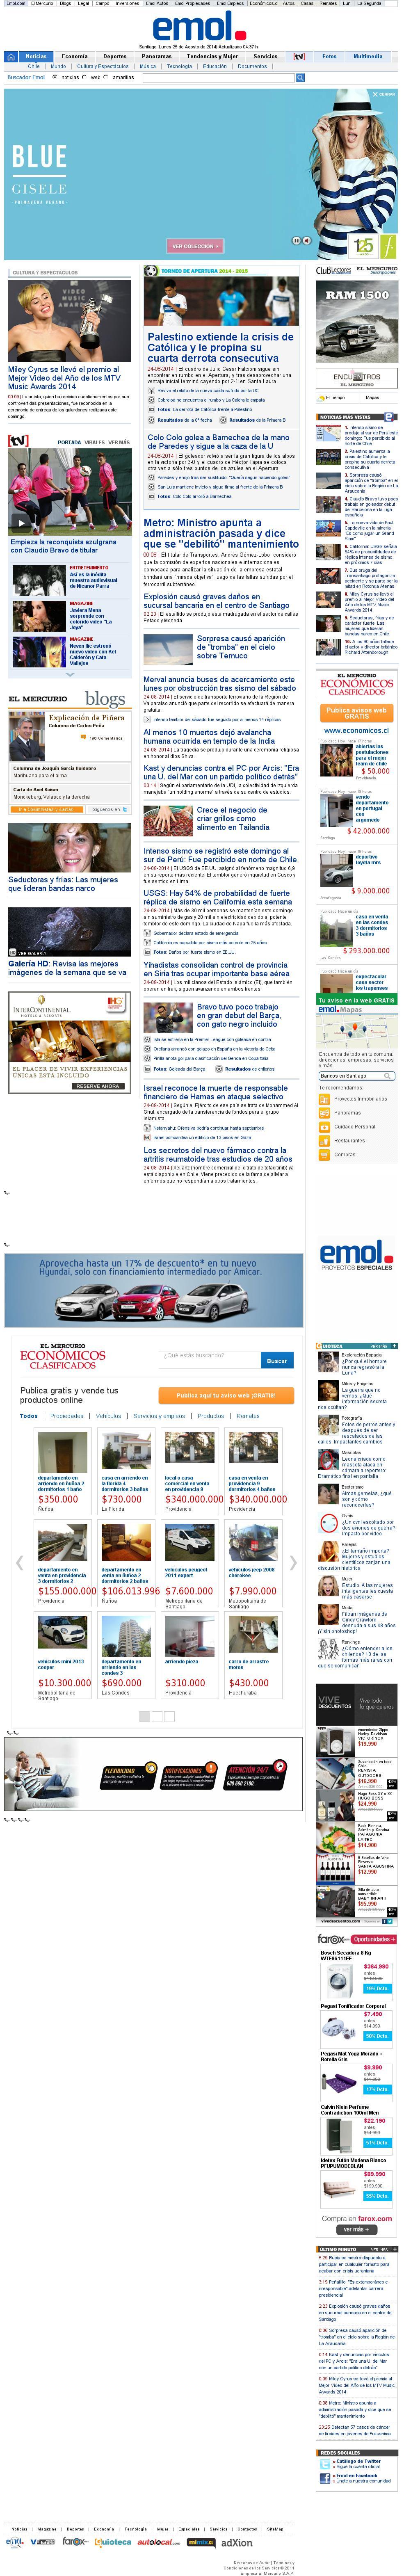 emol at Monday Aug. 25, 2014, 10:05 a.m. UTC